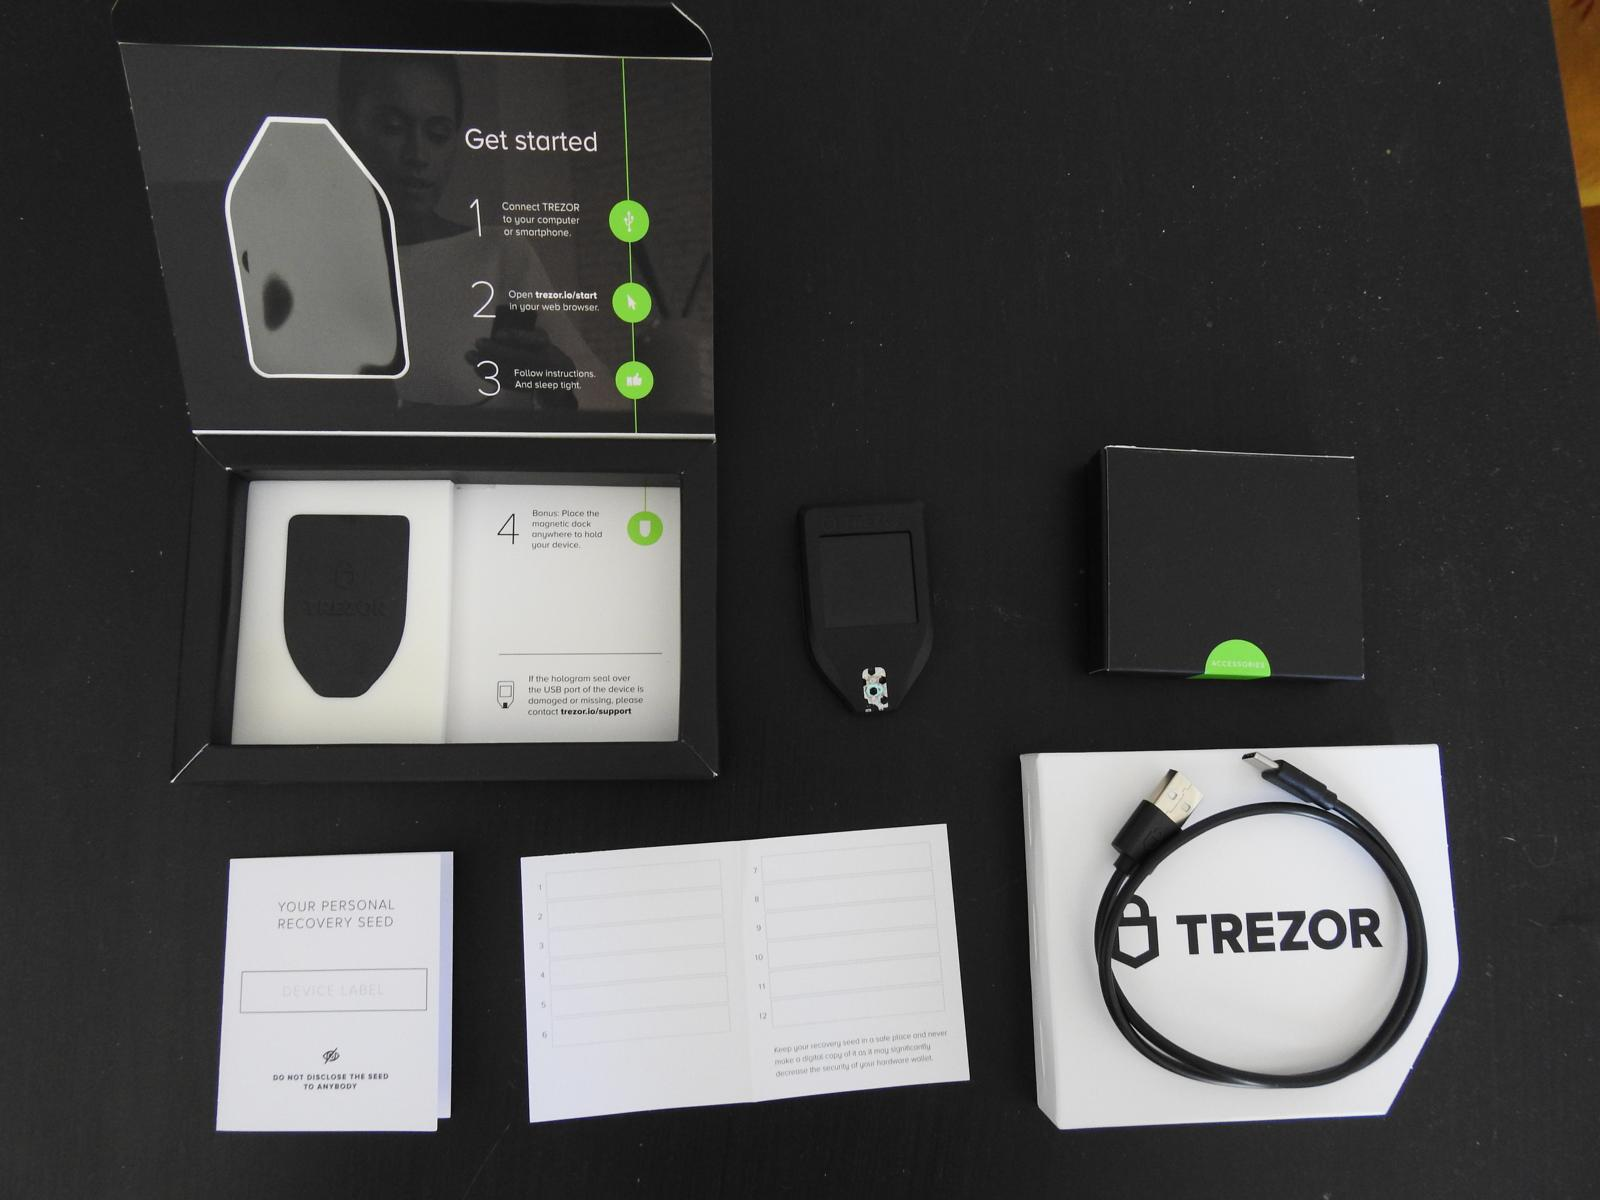 Trezor Model T: Hardware Wallet Comparison, Evaluation